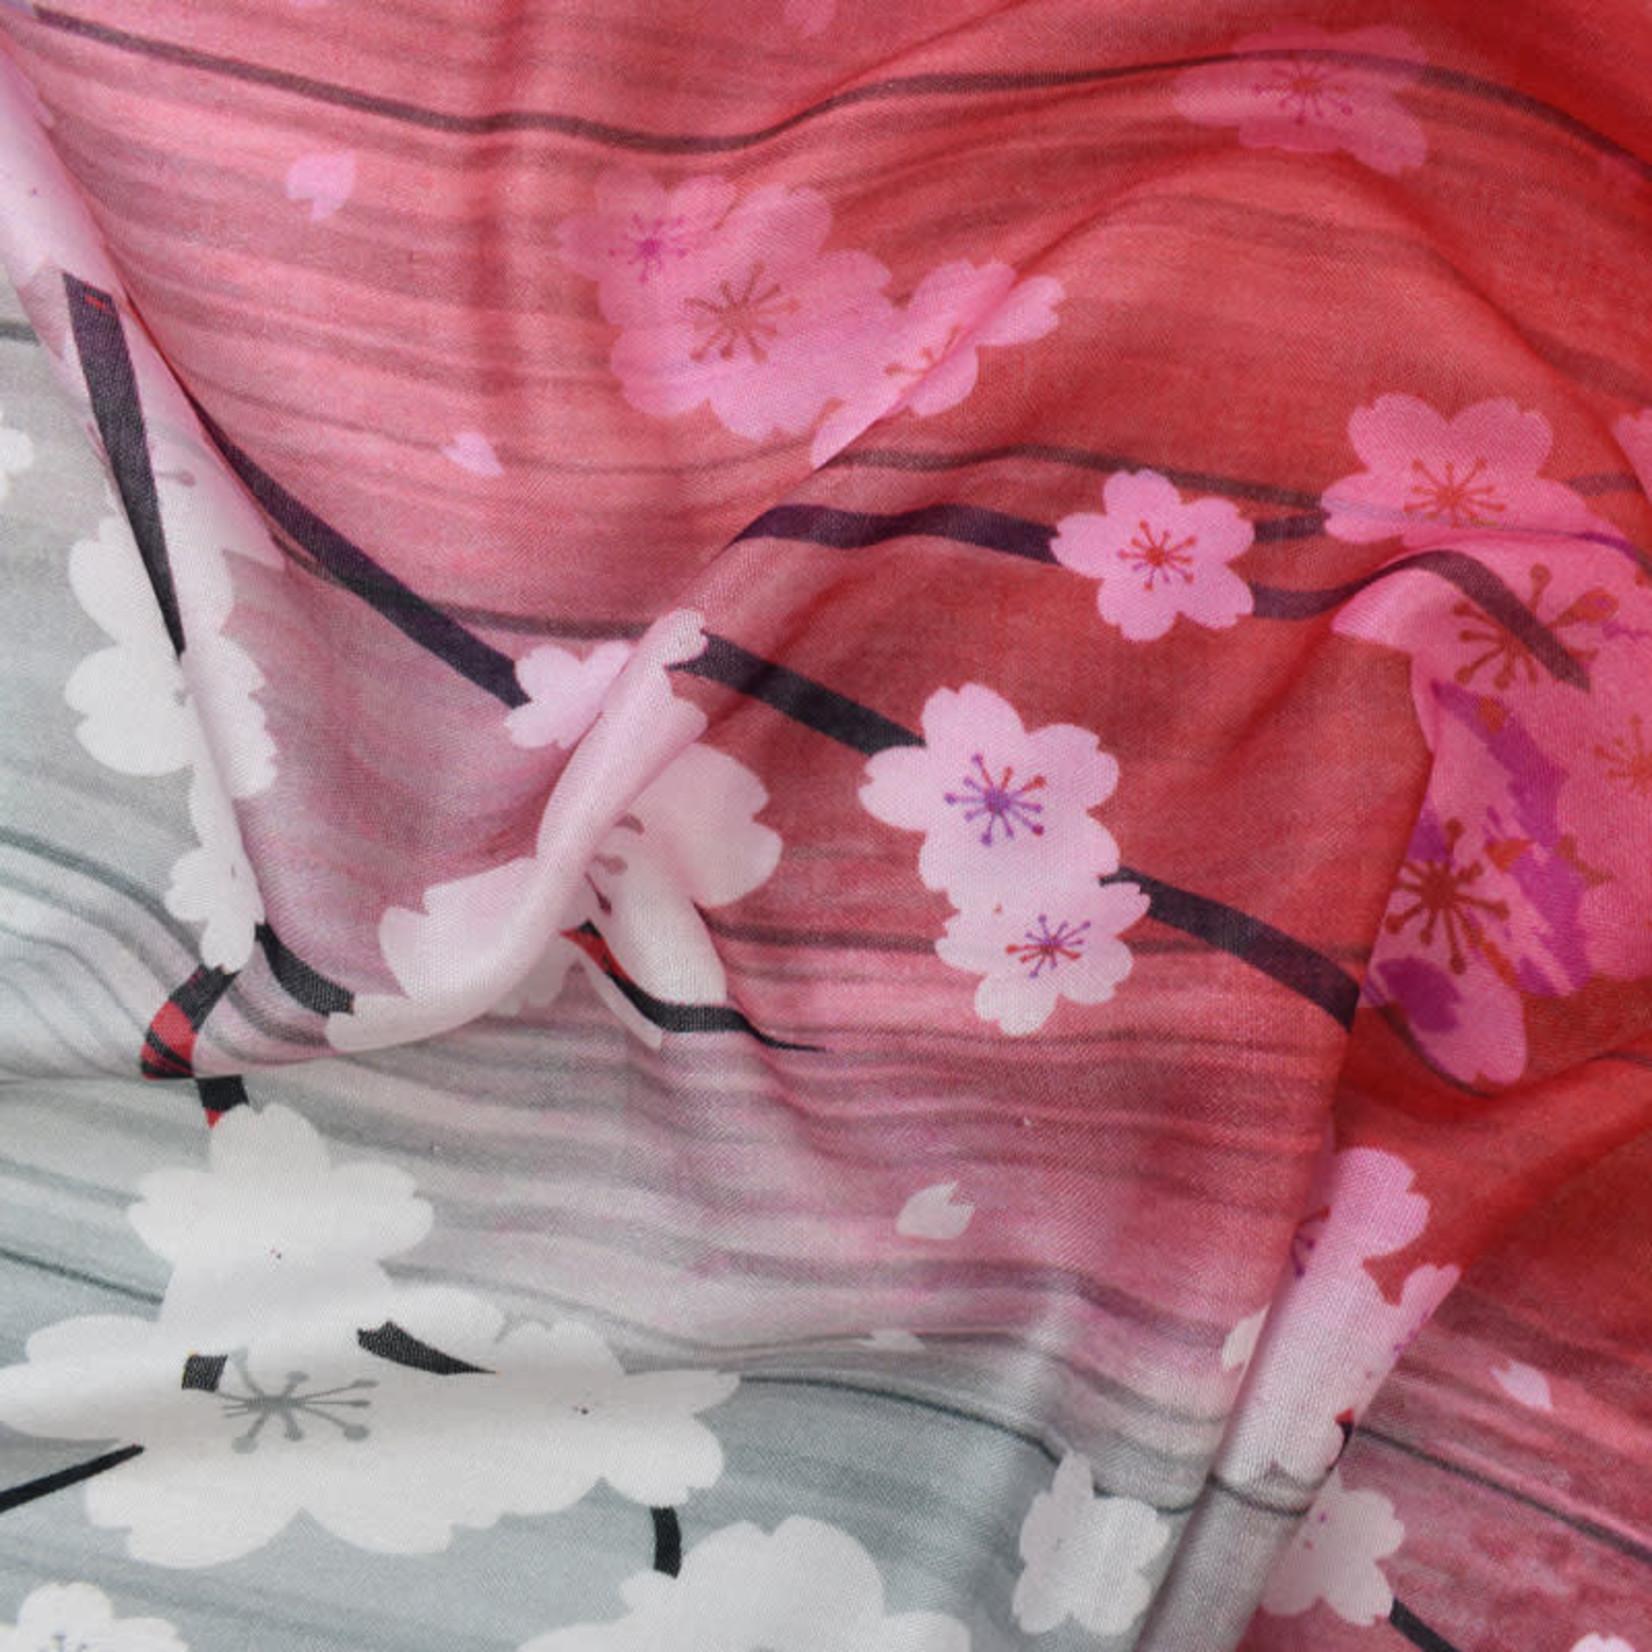 Yoshino Cherry Blossom Scarf